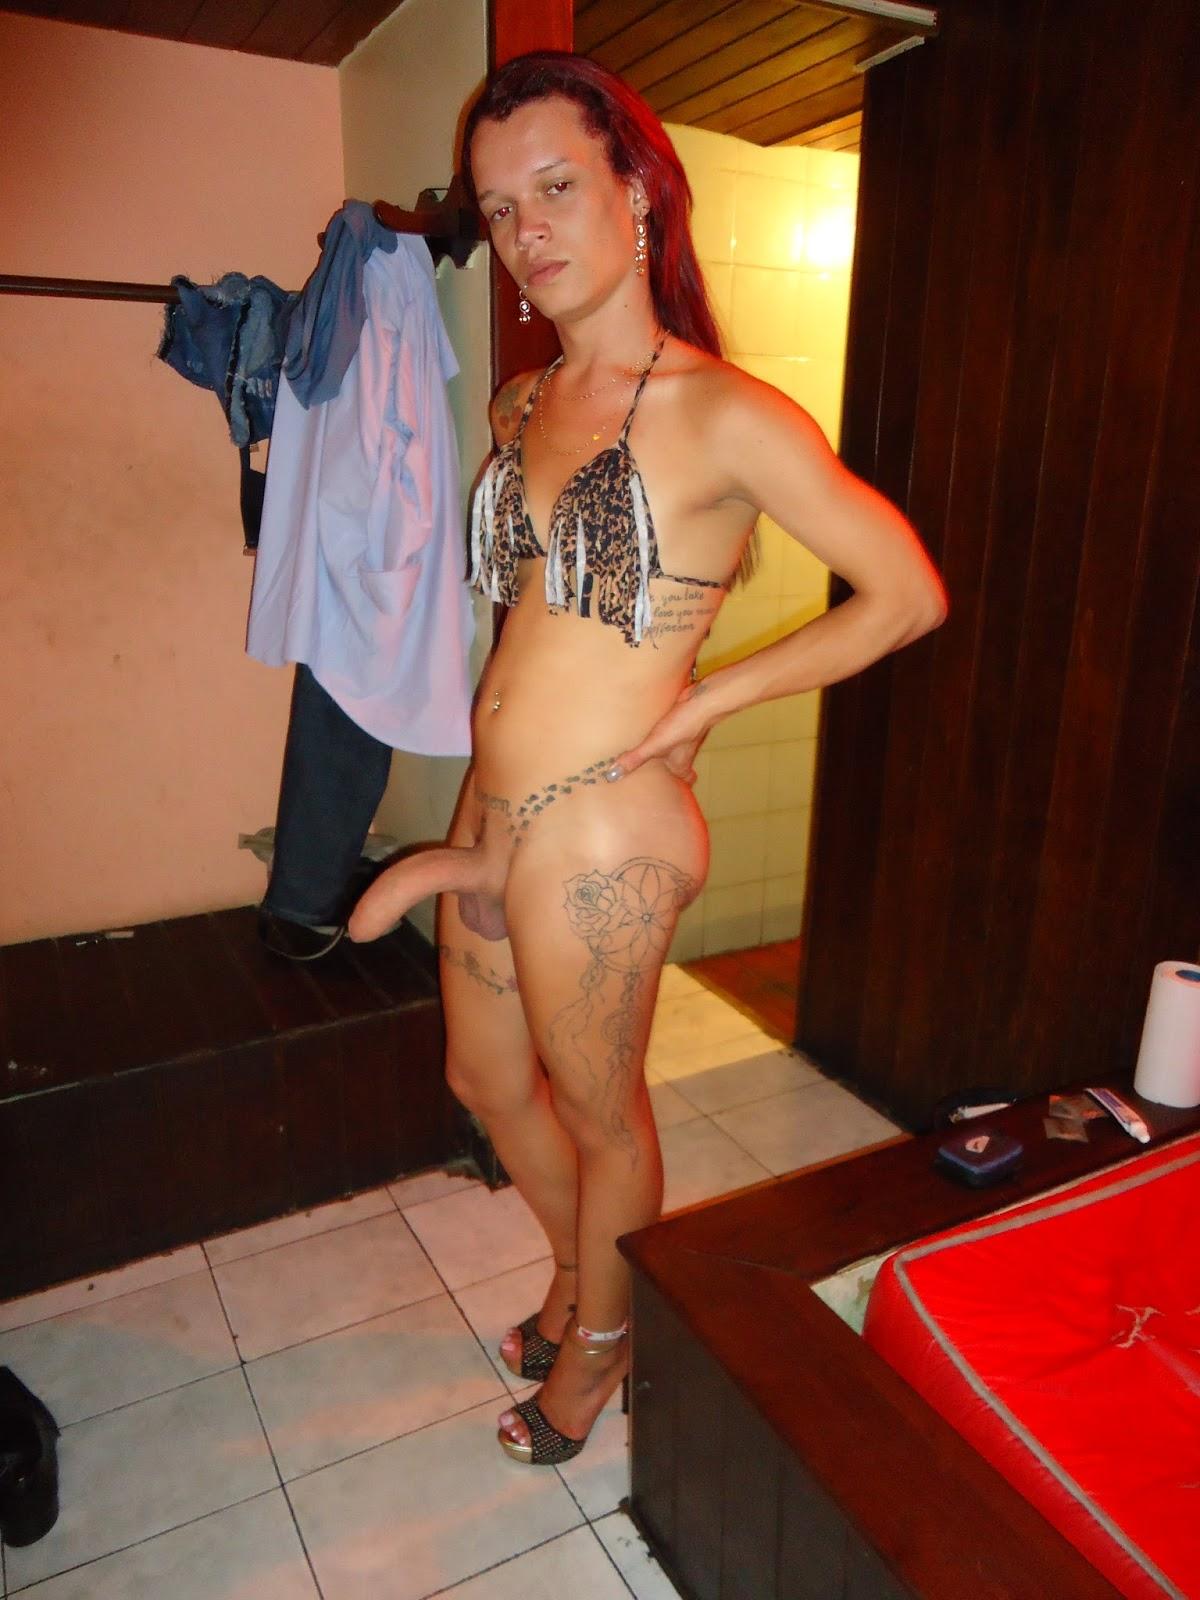 Transexual 3☆☆☆ hmmmm